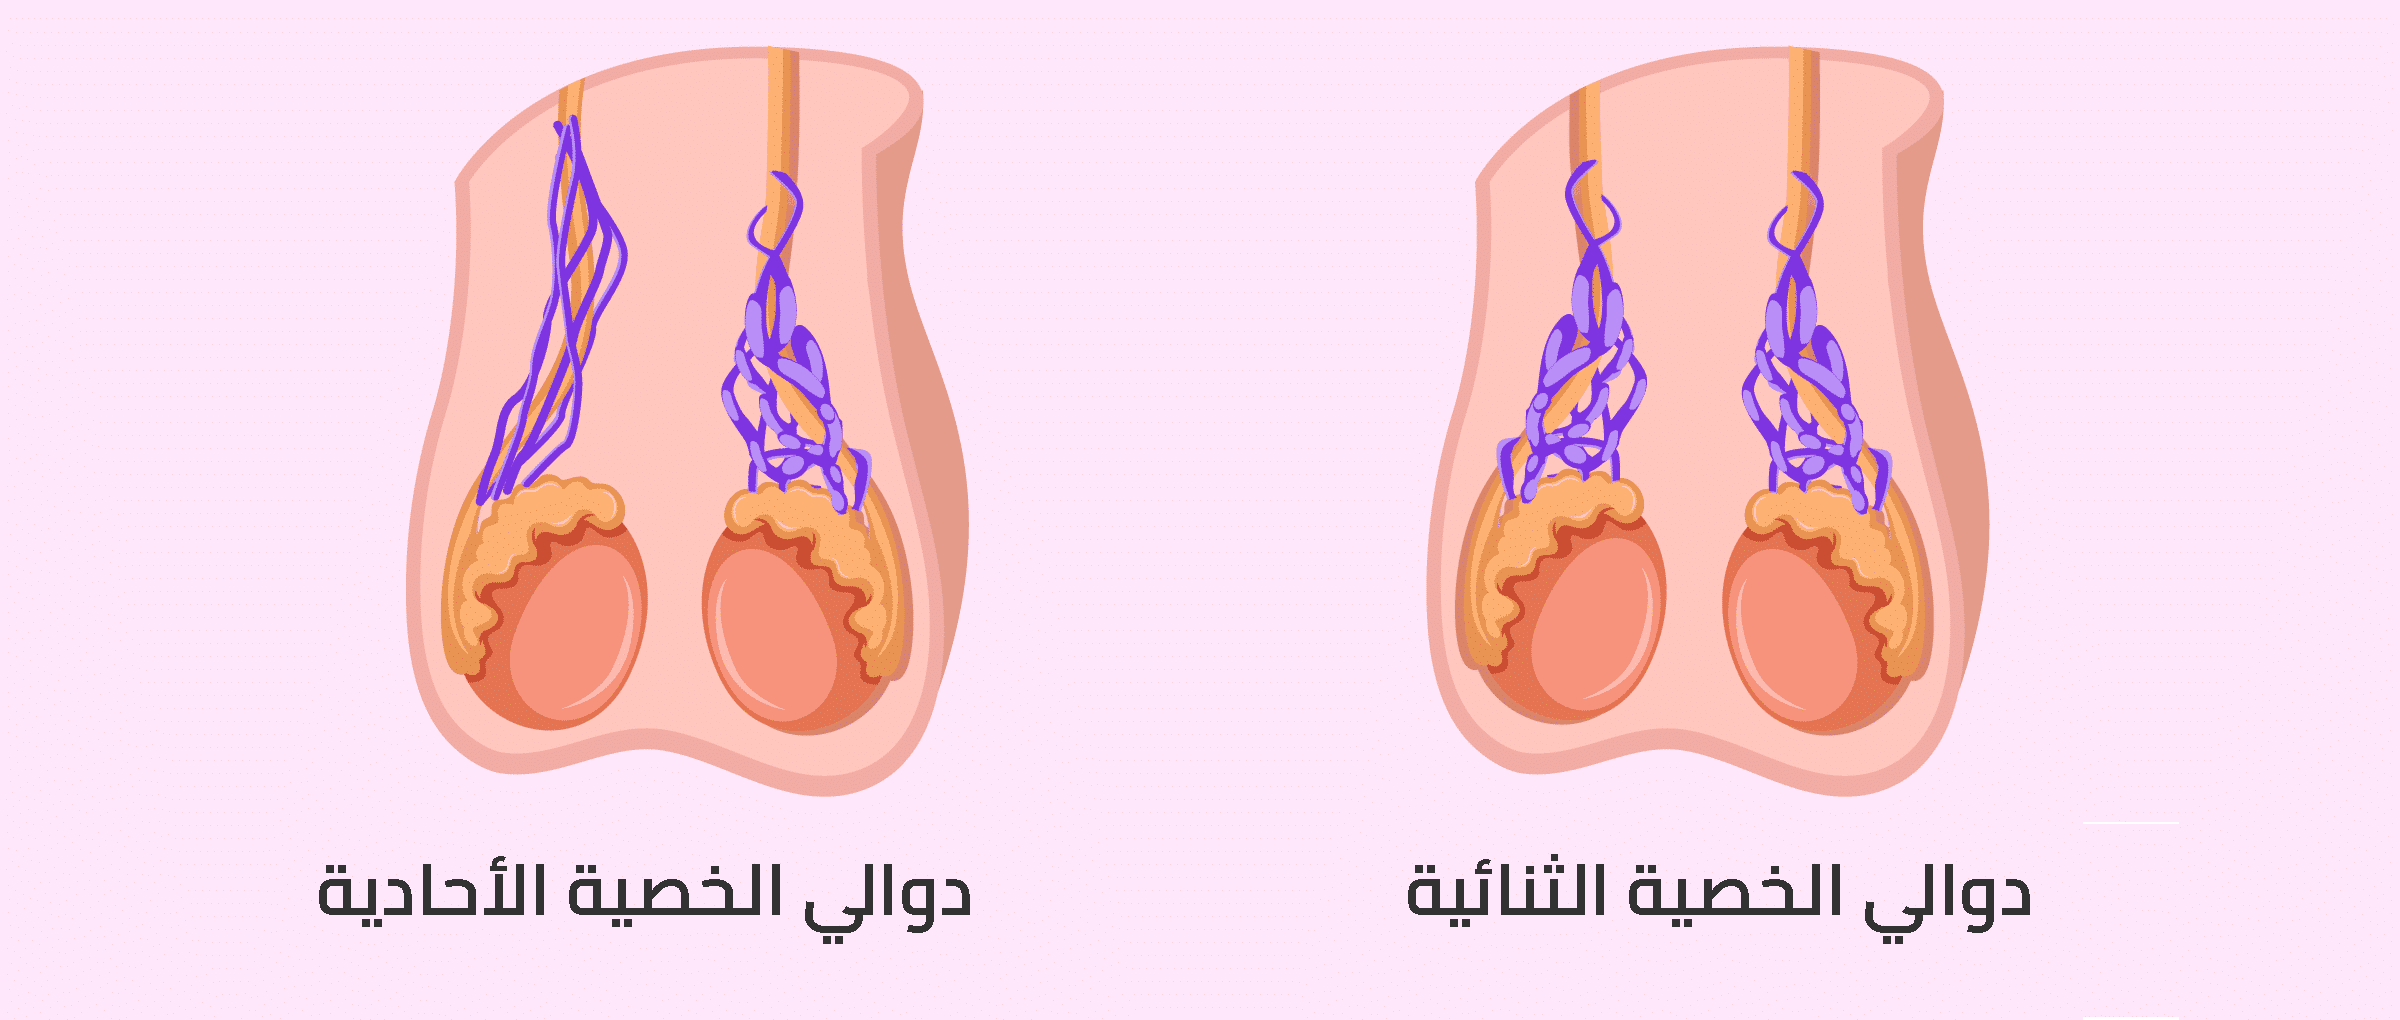 Photo of دوالي الخصية الأسباب الأعراض وطرق العلاج